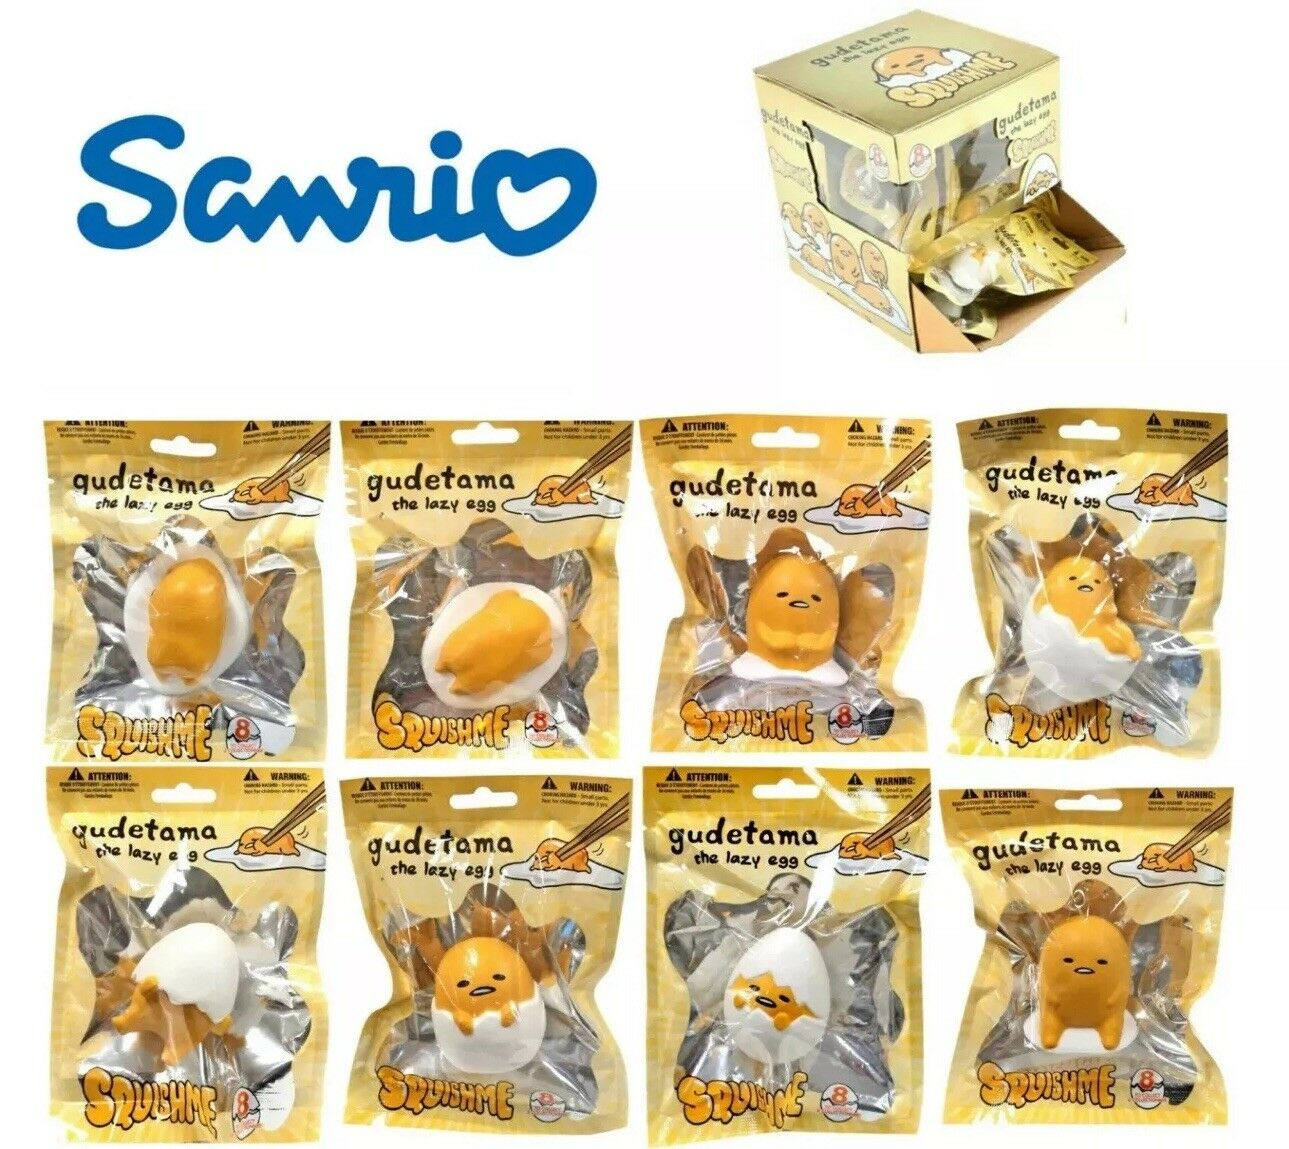 Box of 24 Sanrio GUDETAMA THE LAZY EGG SQUISHME SQUEEZE SQUISHY